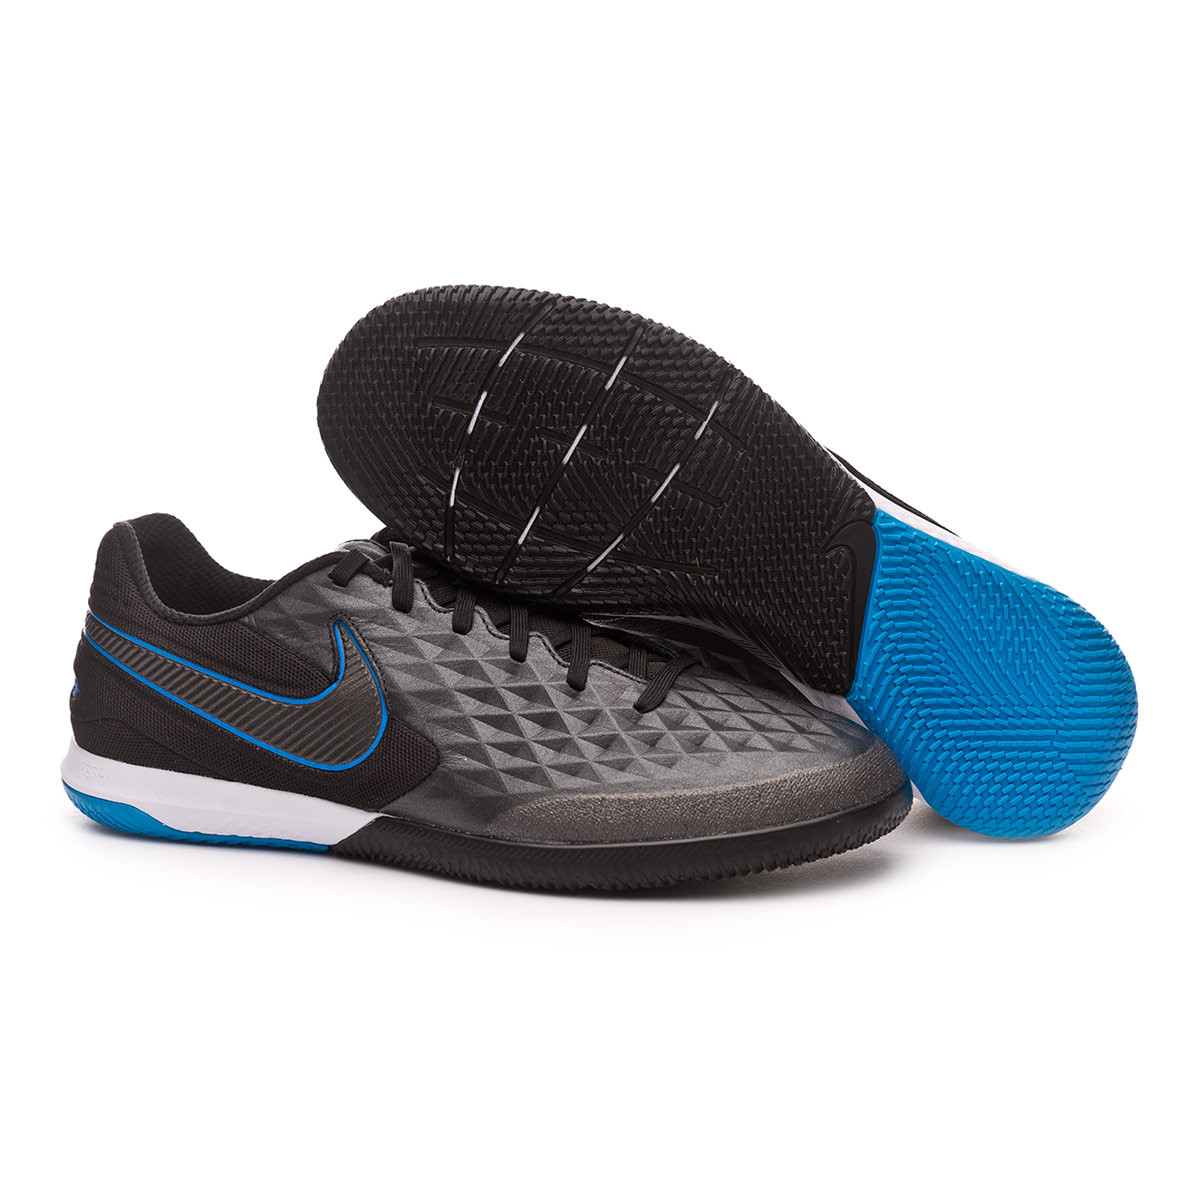 Chaussure de futsal Nike React Tiempo Legend VIII Pro IC